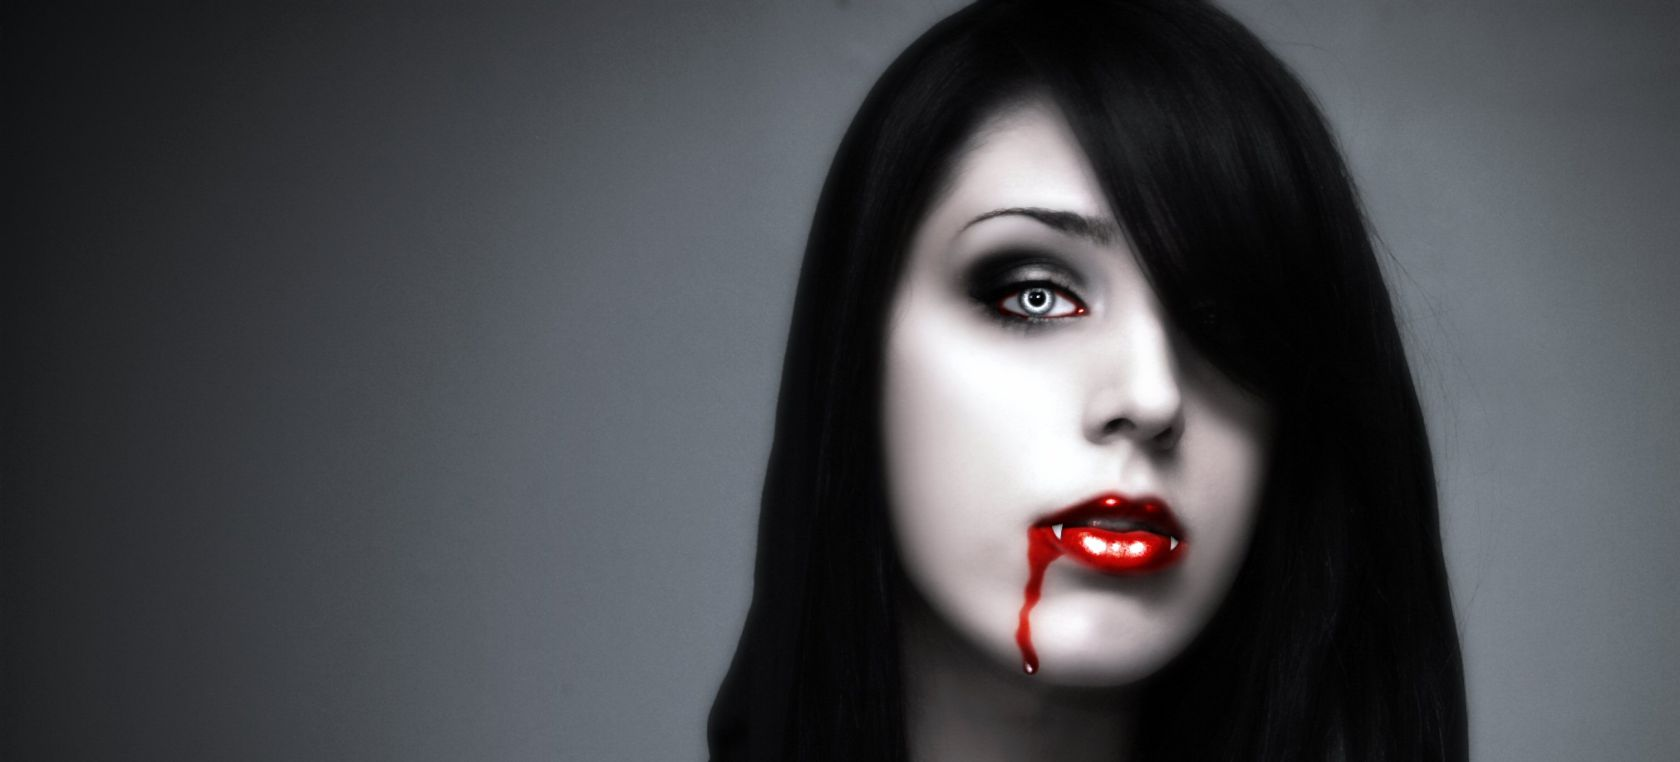 Vampirismo pareja Texas: Una pareja lleva el fetiche de